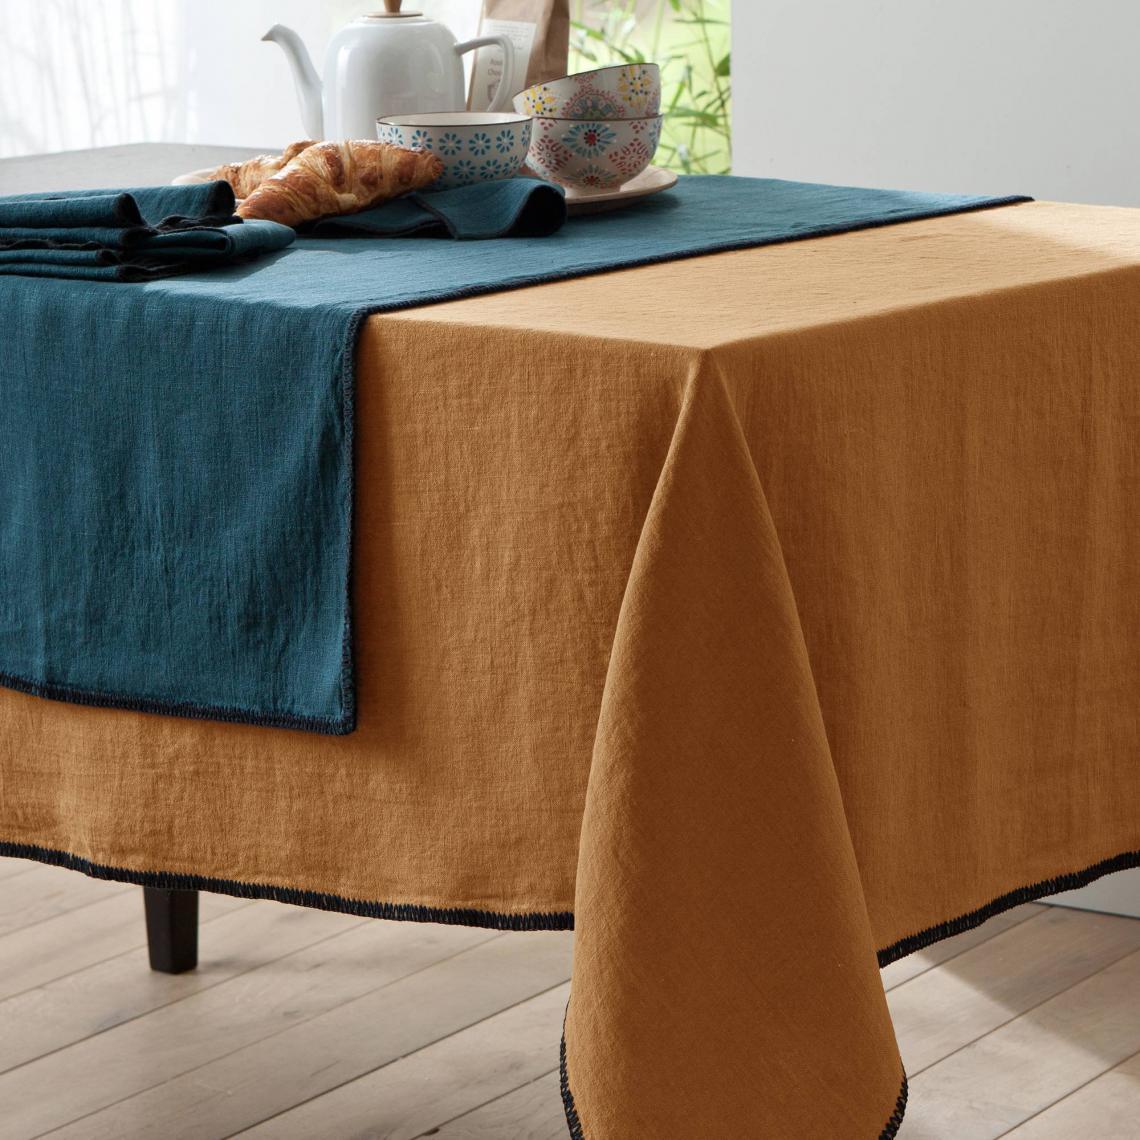 harmony linge de maison ventana blog. Black Bedroom Furniture Sets. Home Design Ideas